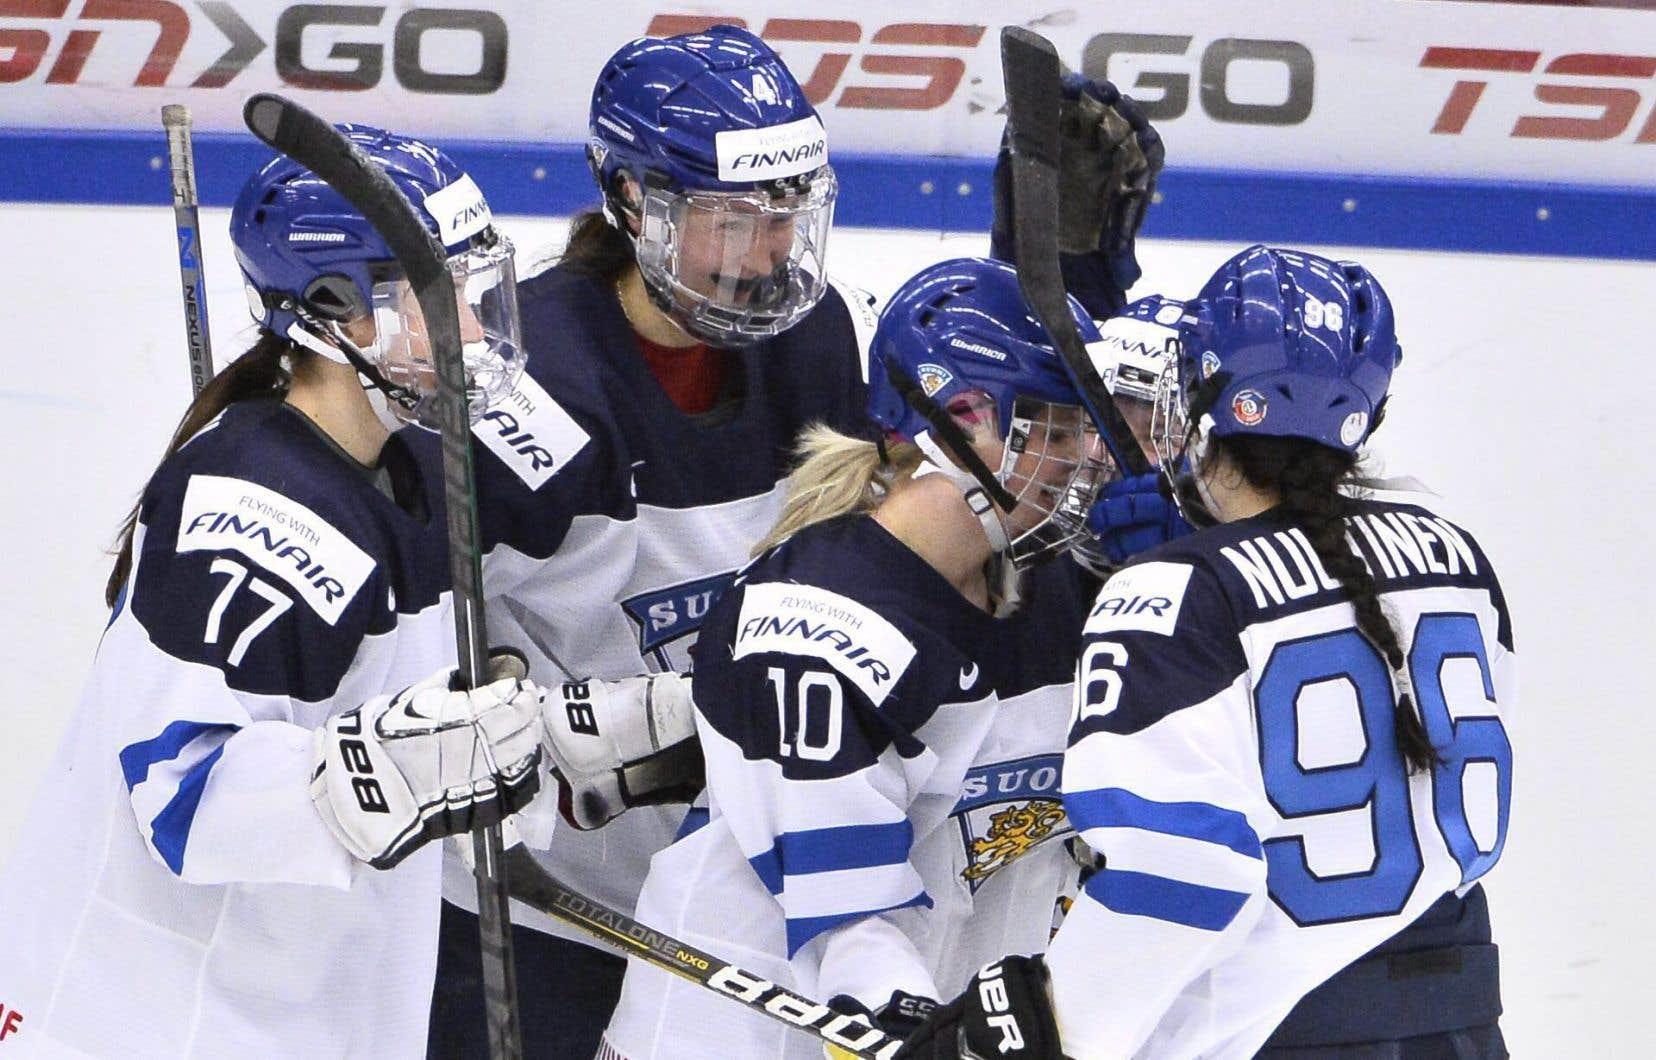 Sara Sakkinen, Linda Valimaki (au centre, #10), Jenni Hiirikoski et Susanna Tapani ont touché la cible pour la Finlande.